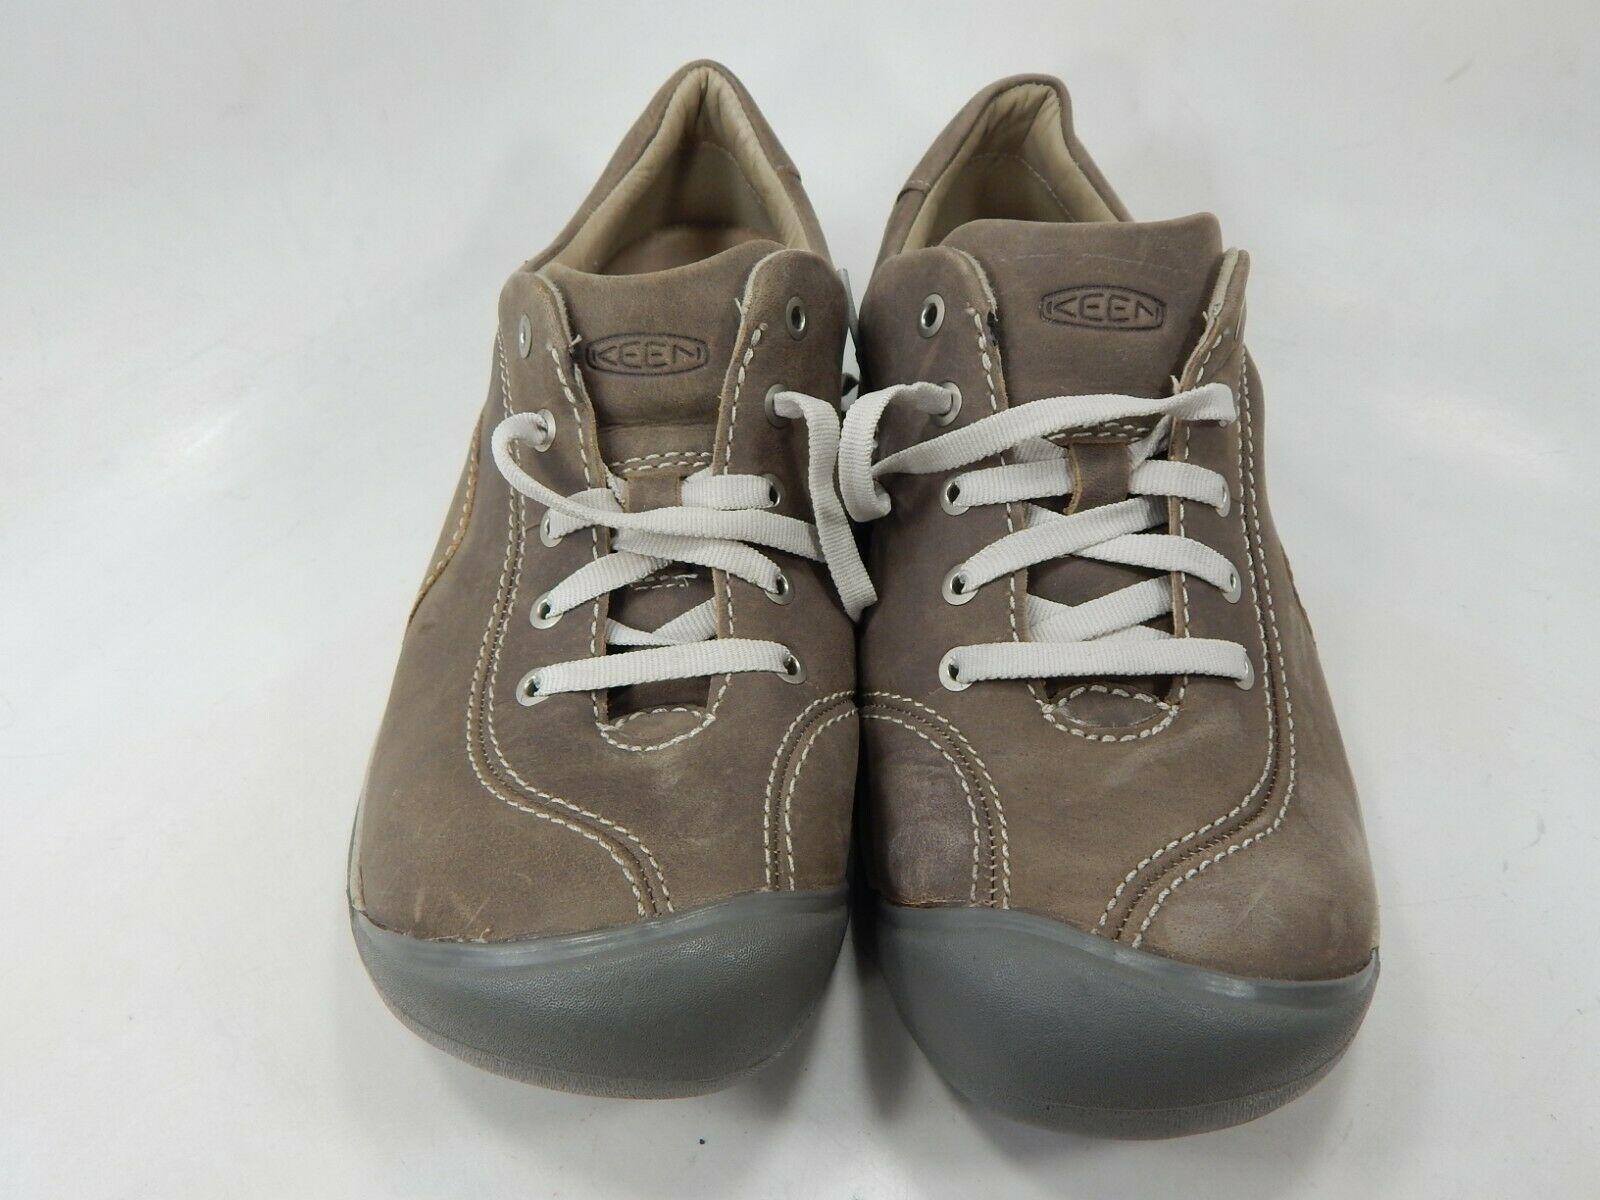 Keen Presidio II Misura 7 M (B) Eu 37.5 Donna Casual Oxford Shoes Paloma 1018316 image 2